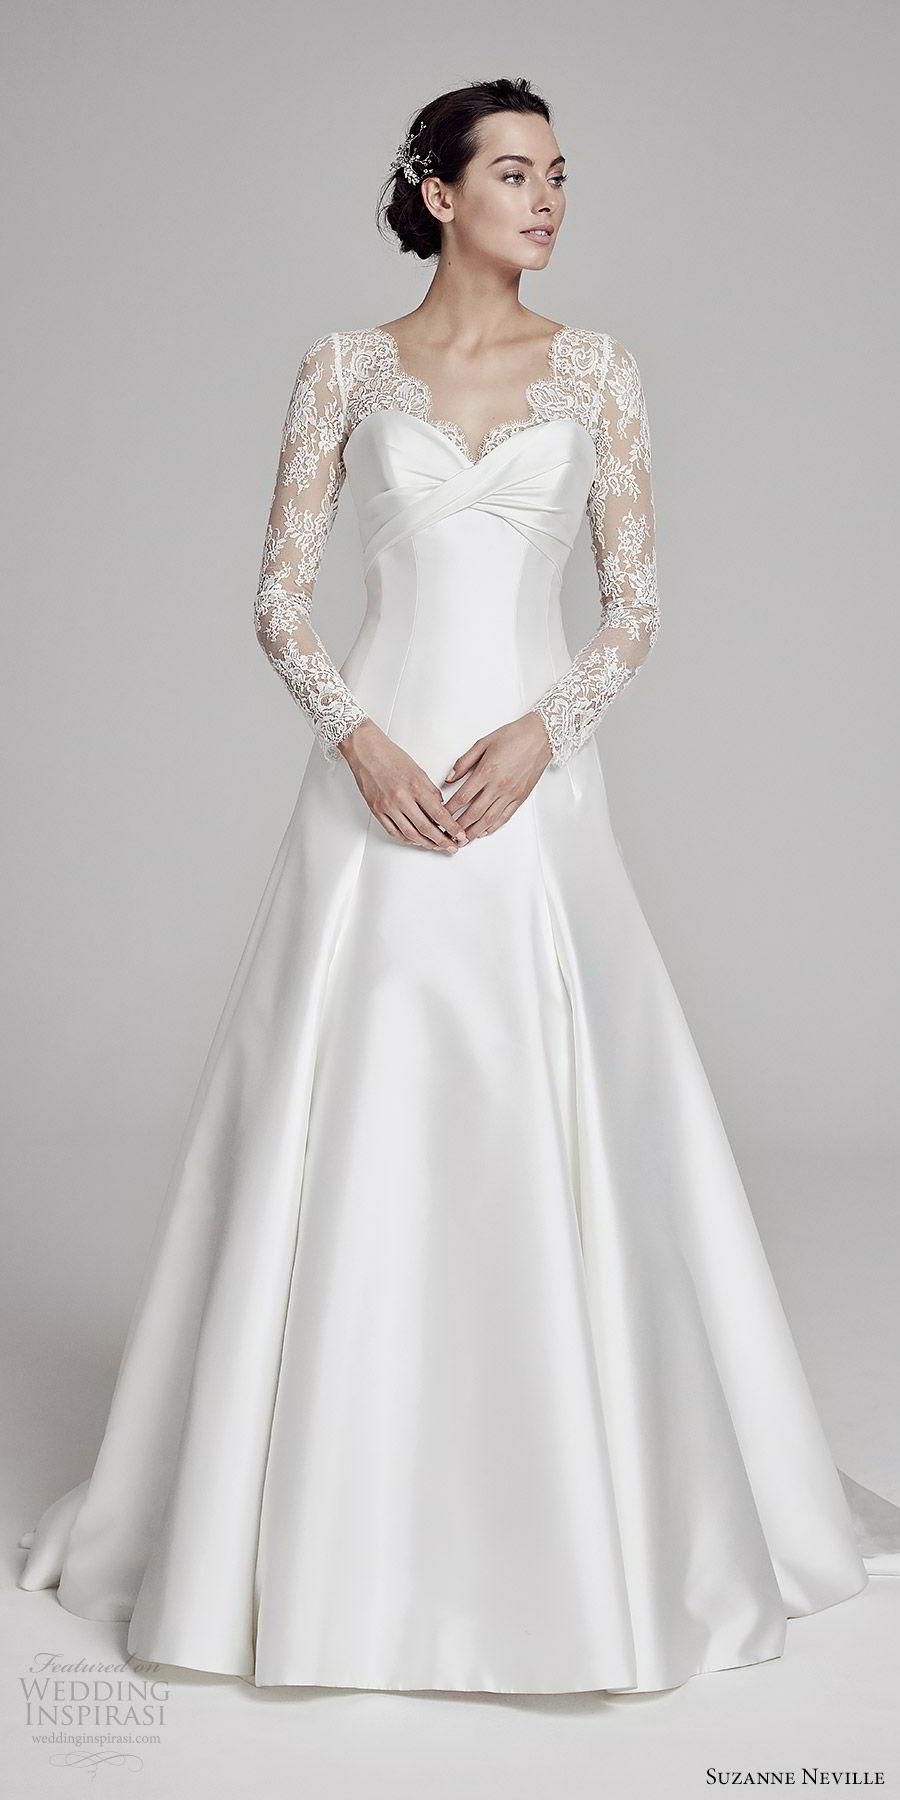 suzanne neville bridal 2019 illusion long sleeves sheer v neck sweetheart a line wedding dress (livia) sweep train classic romantic mv